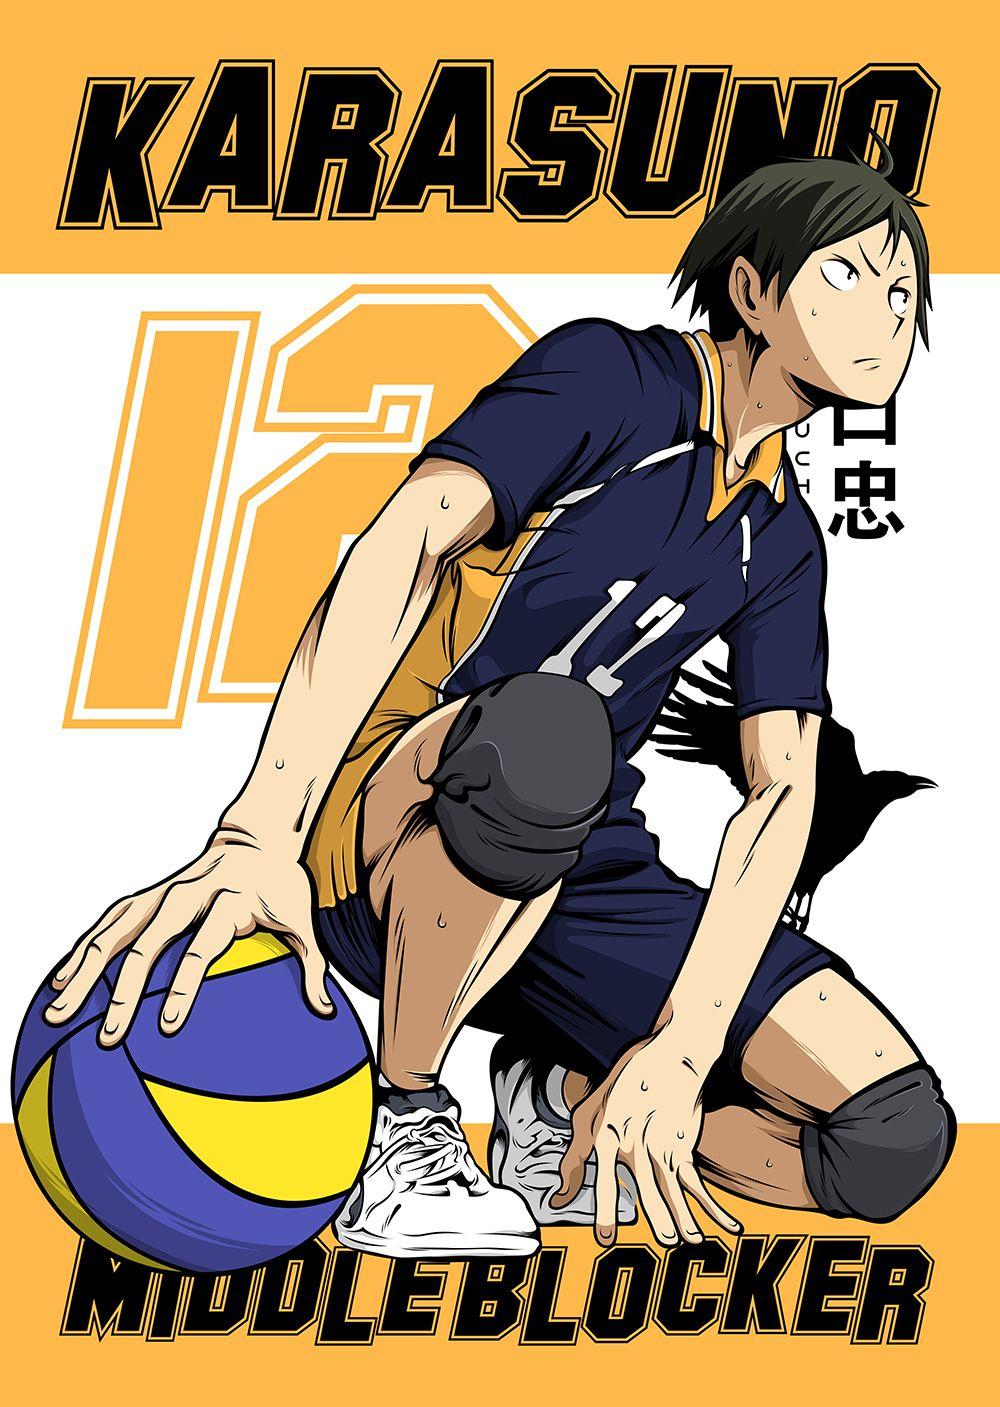 Anime Haikyuu Yamaguchi Metal Poster Print Team Awesome Displate In 2020 Yamaguchi Haikyuu Haikyuu Anime